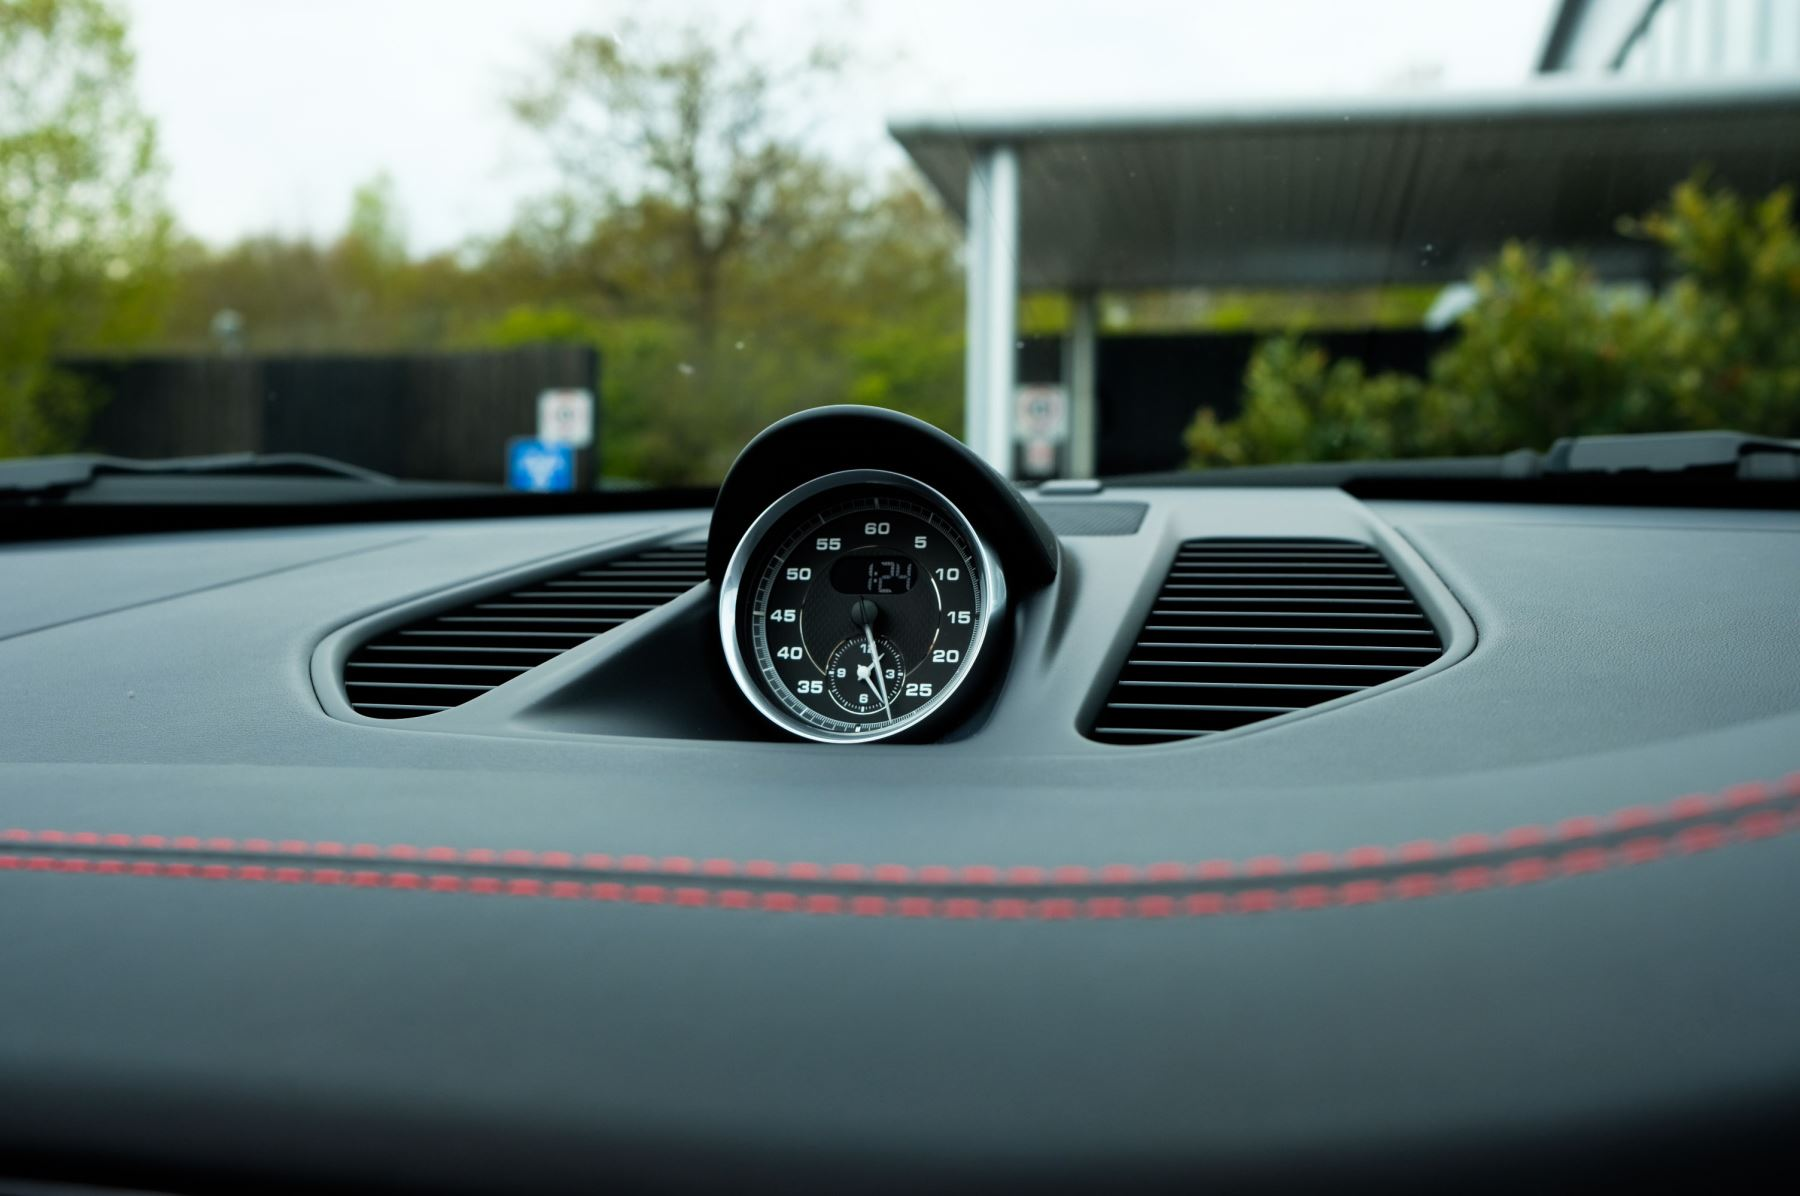 Porsche 911 TARGA 4 GTS - PDK - SPORT DESIGN PACKAGE - GTS INTERIOR PACKAGE image 27